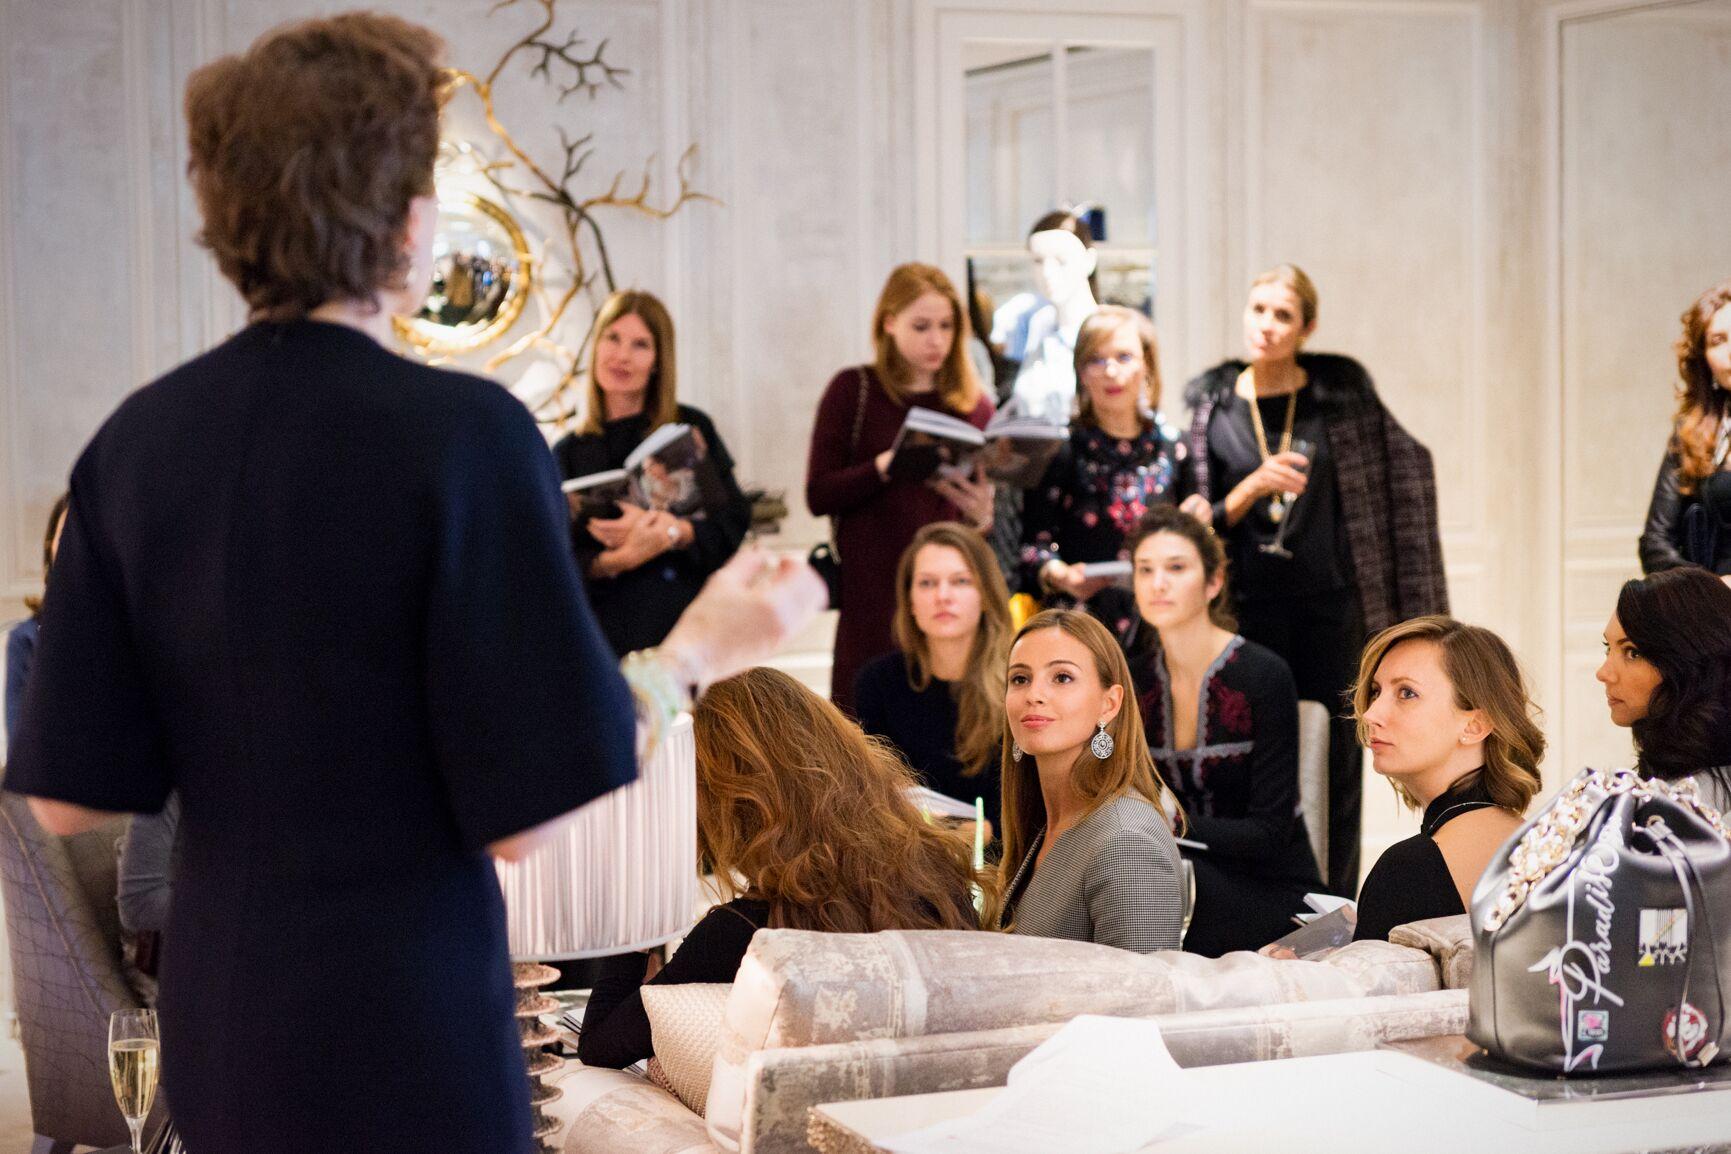 Soirée at Dior with Natasha Fraser-Cavassoni